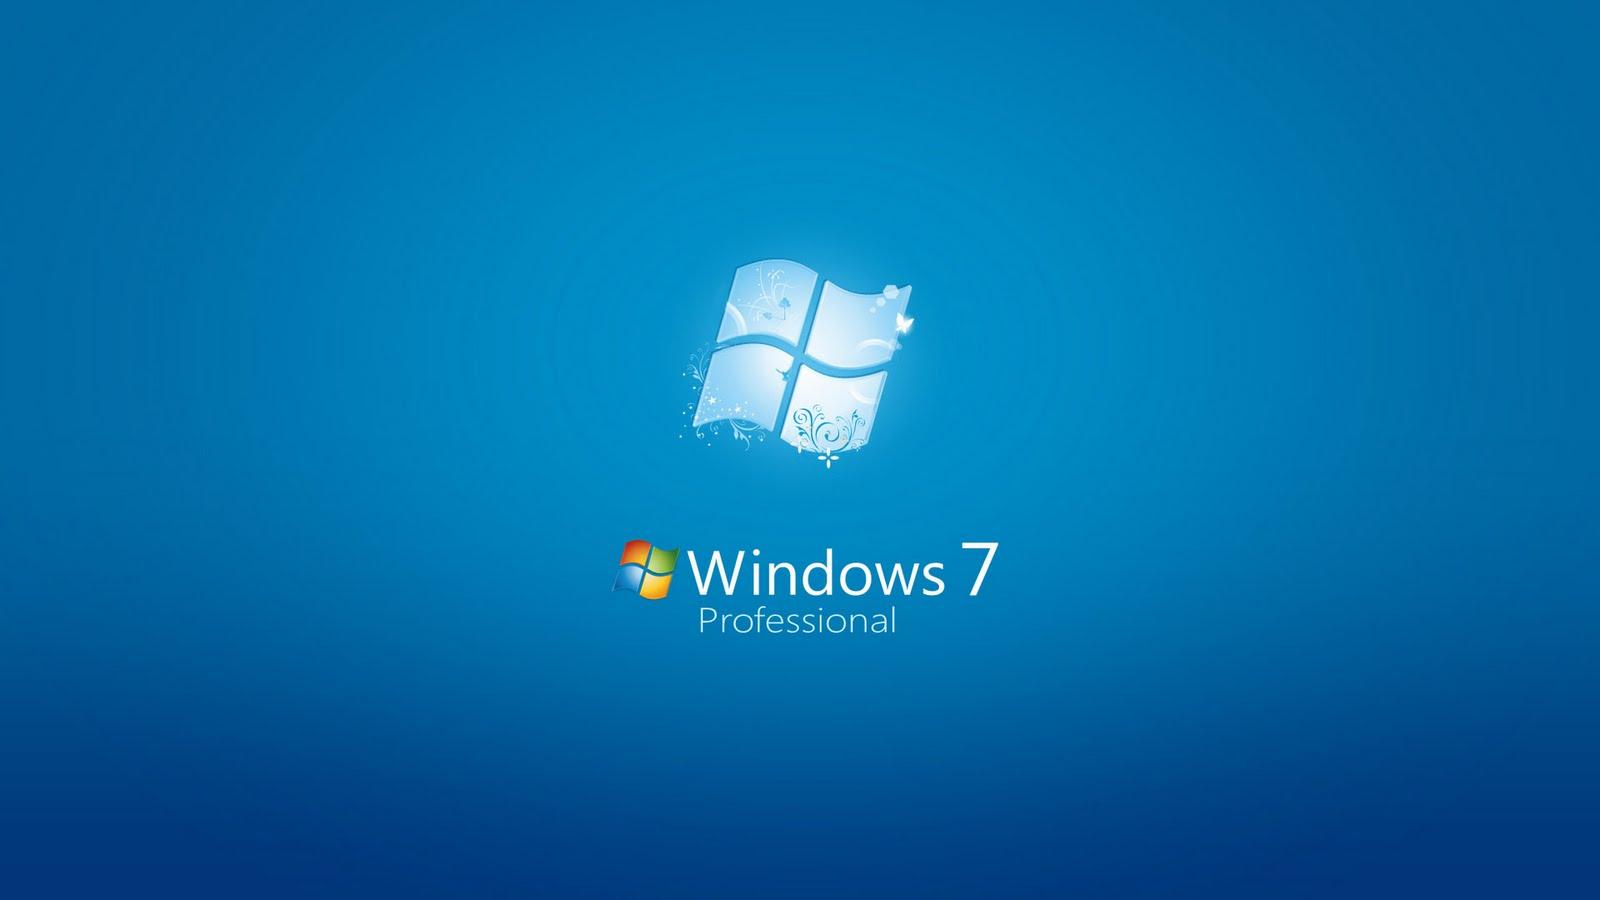 windows 7 professional 64 bit oem fqc 04649 ms vega computers. Black Bedroom Furniture Sets. Home Design Ideas